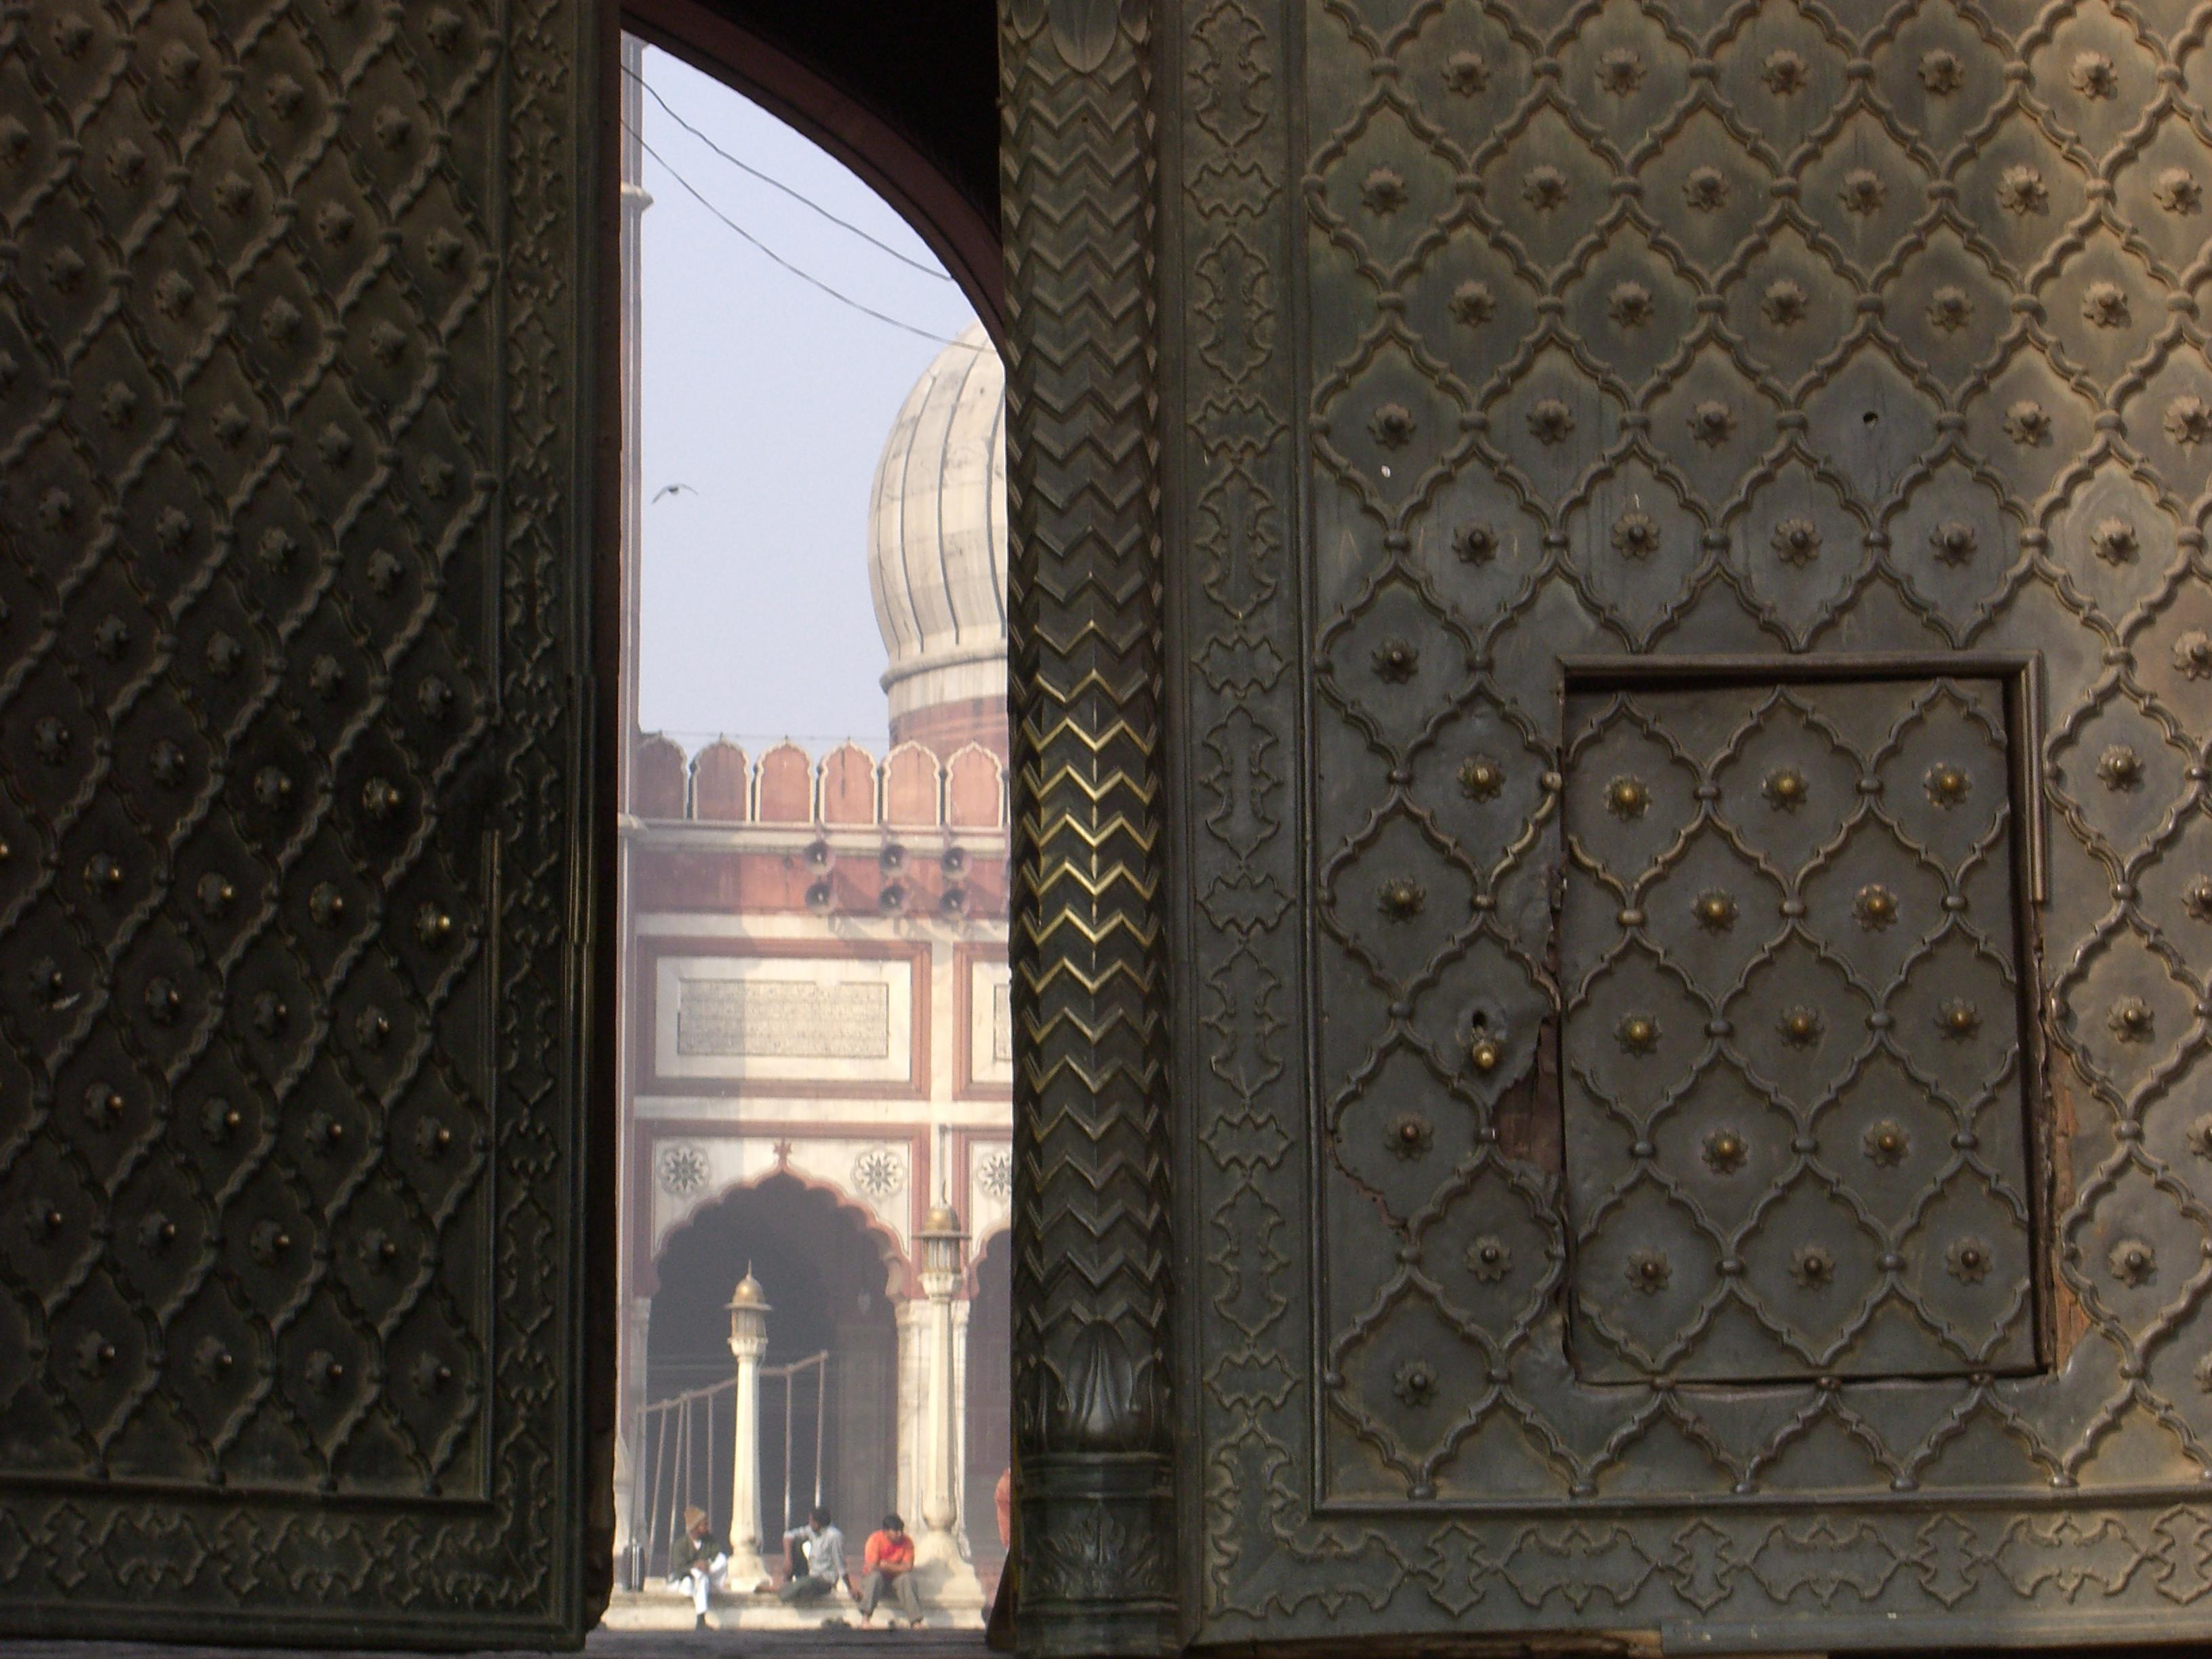 FileDetails of the door to Jama Masjid Delhi.jpg & File:Details of the door to Jama Masjid Delhi.jpg - Wikimedia Commons